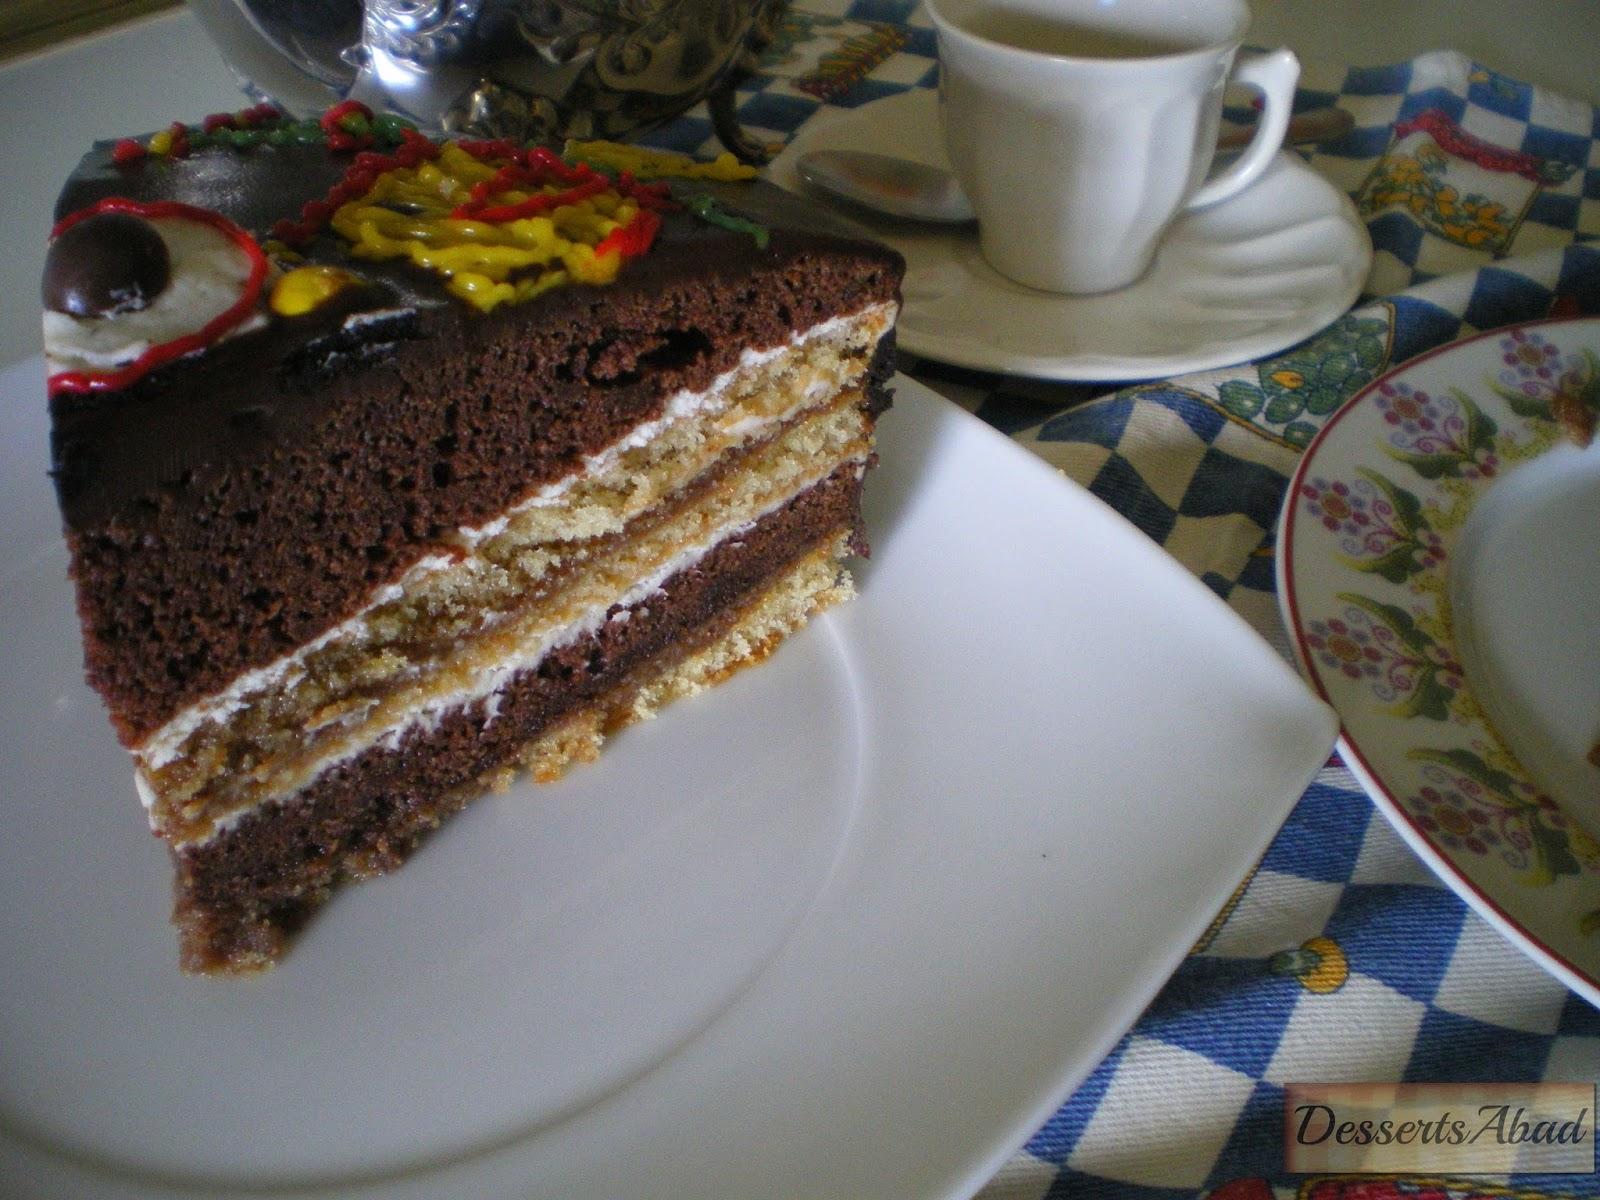 Tarta de chocolate, nata y caramelo